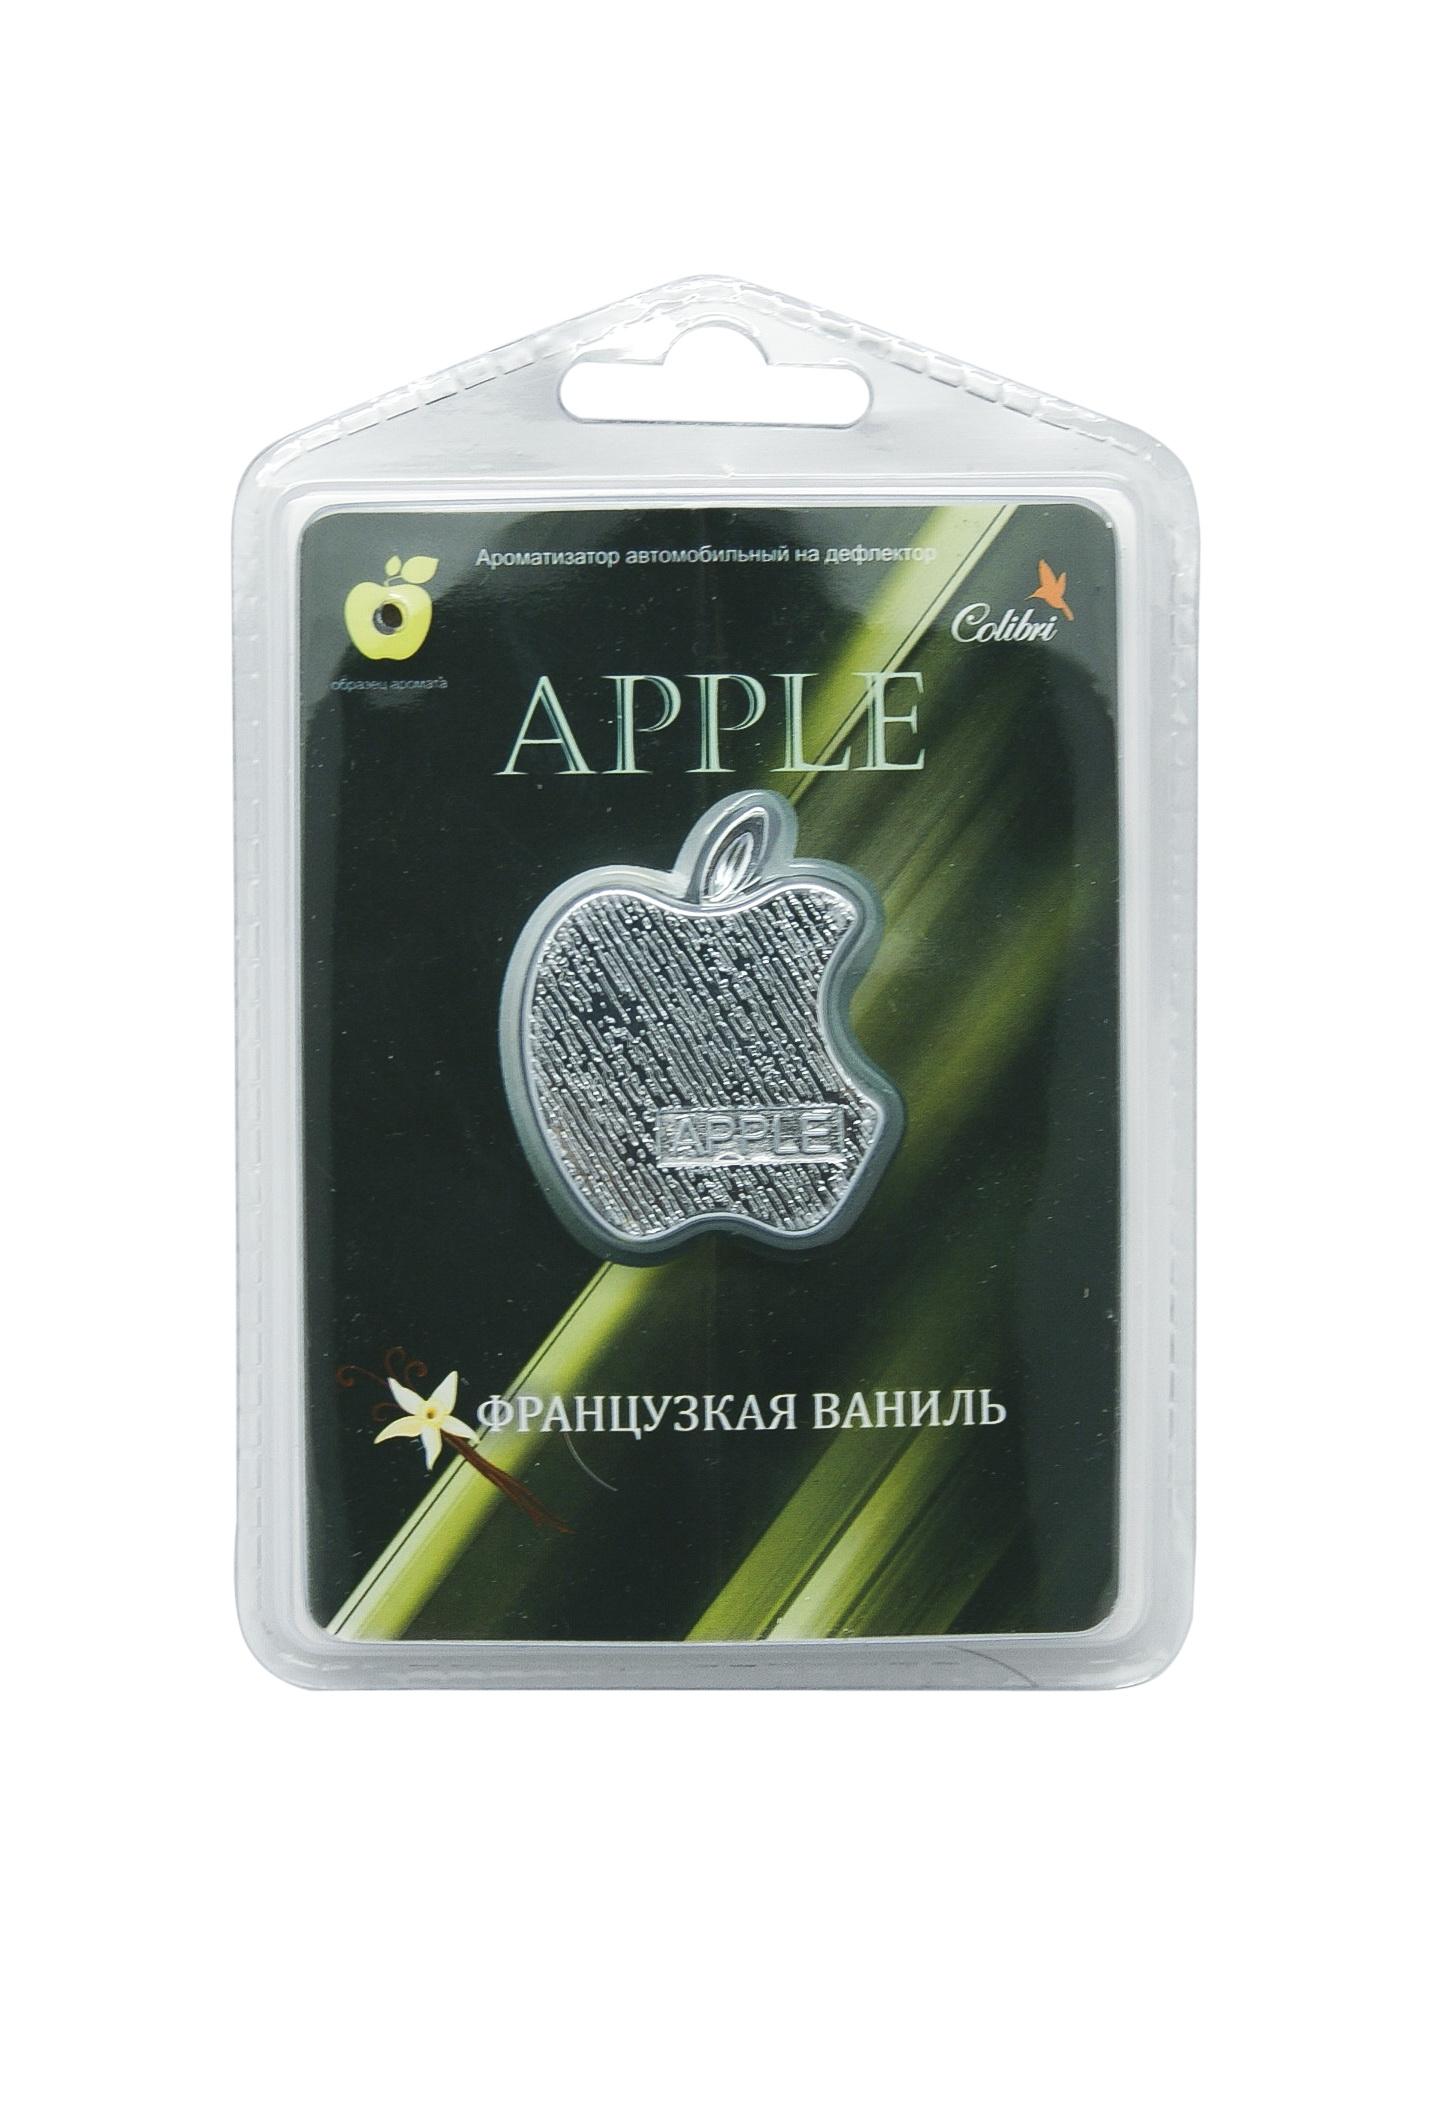 Ароматизатор AzardАроматизаторы<br>Аромат: ваниль,<br>Тип: на дефлектор<br>